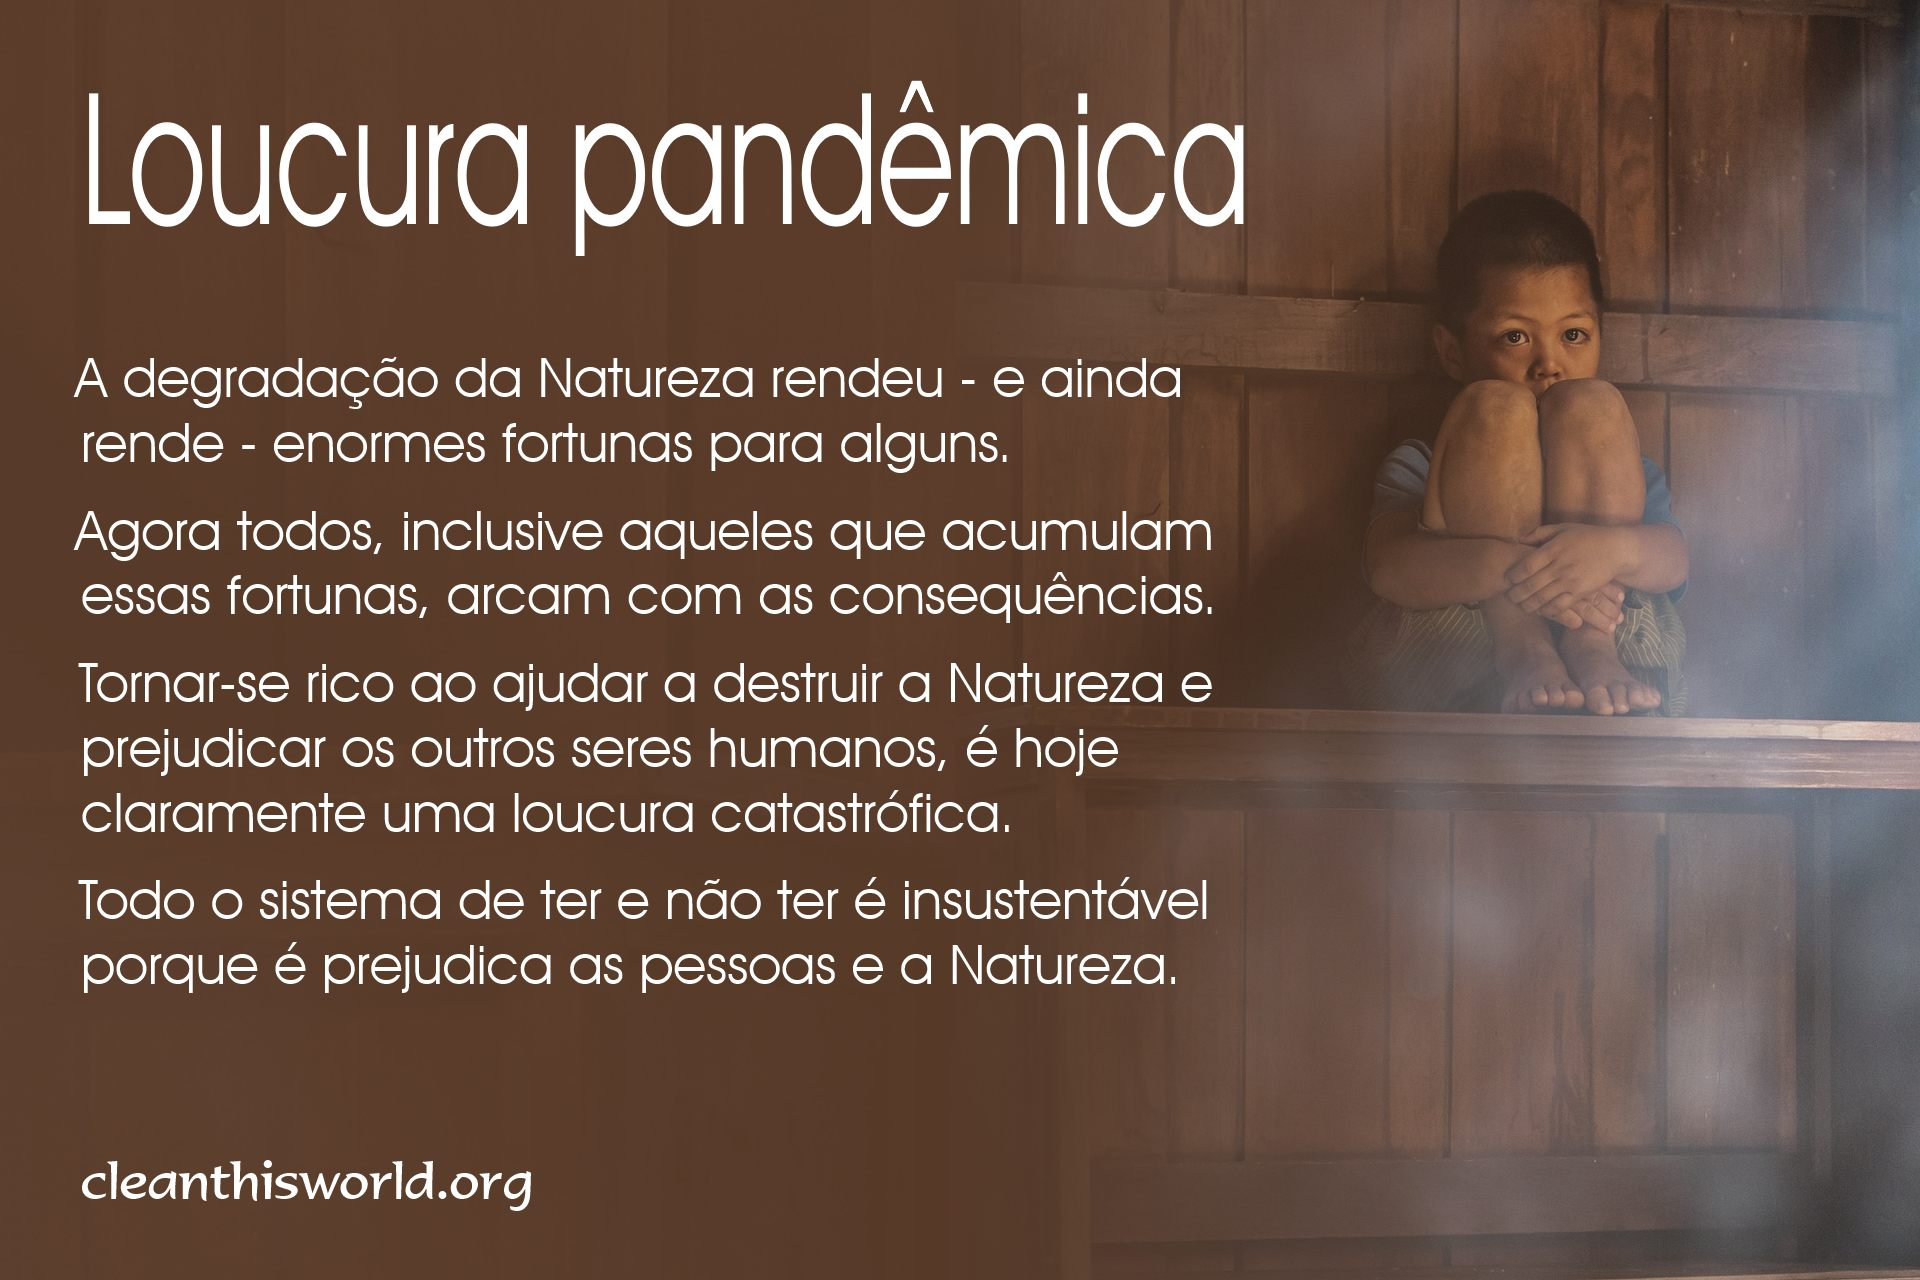 Loucura pandêmica